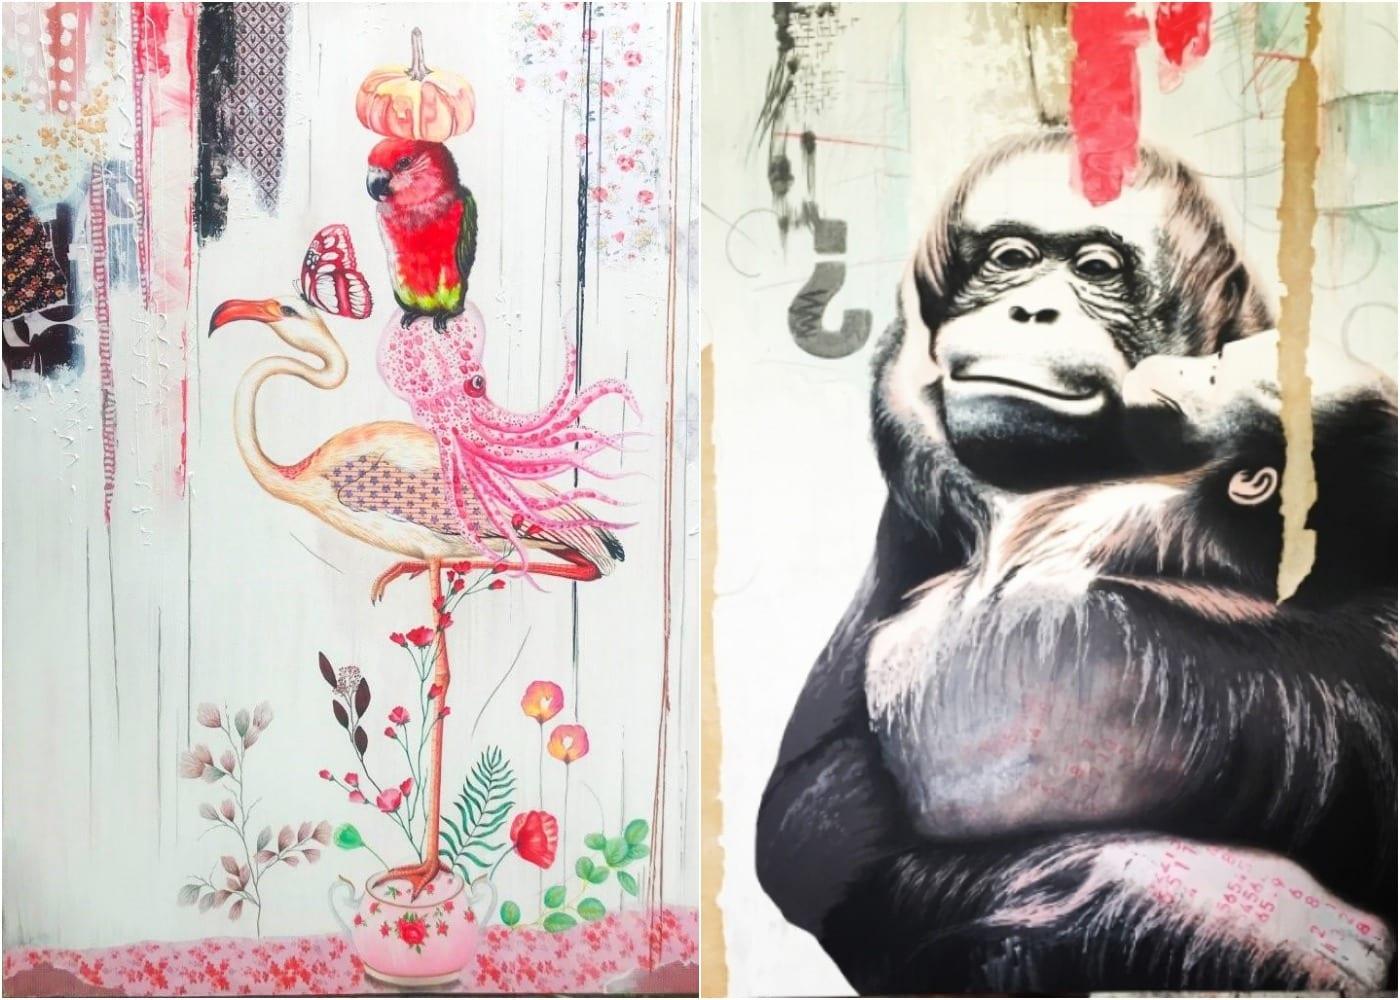 """The Harmony of Things"" & Orangutan"" paintings by Irene Hoff - an artist in Bali, Indonesia"